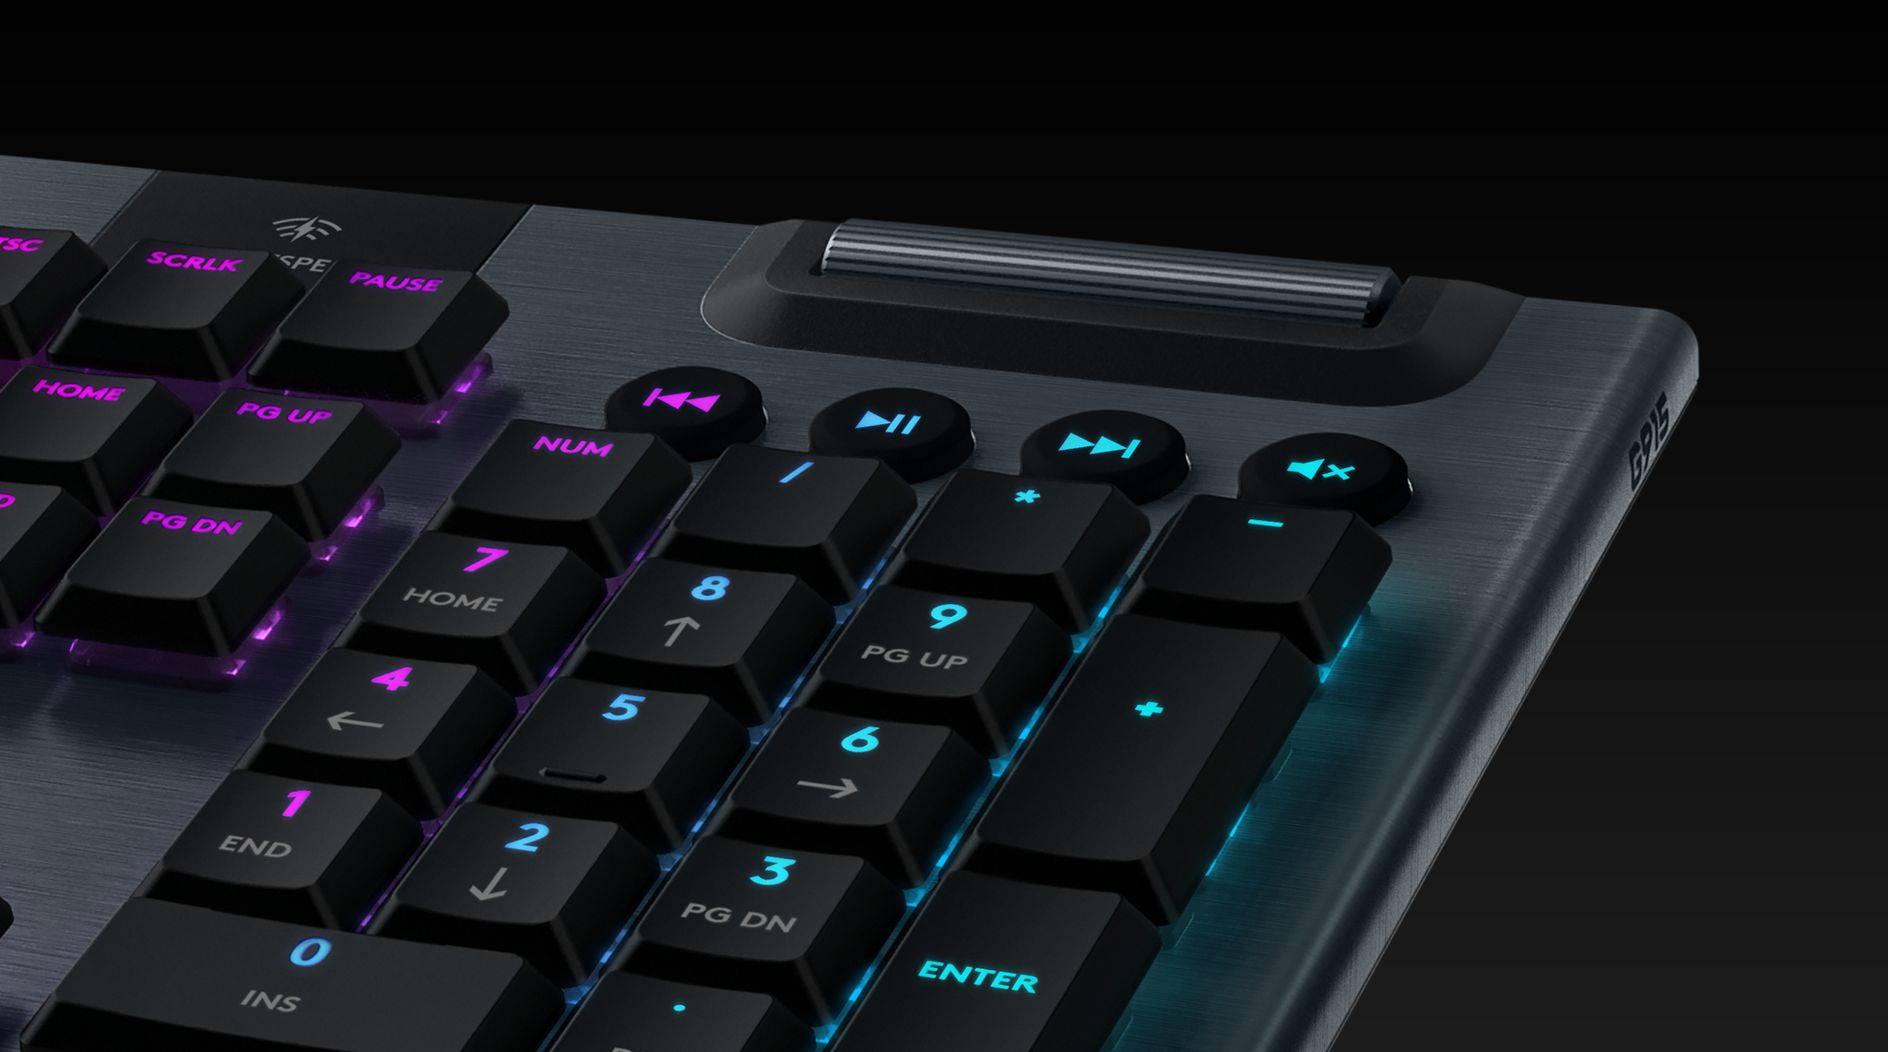 Конструкция клавиатуры